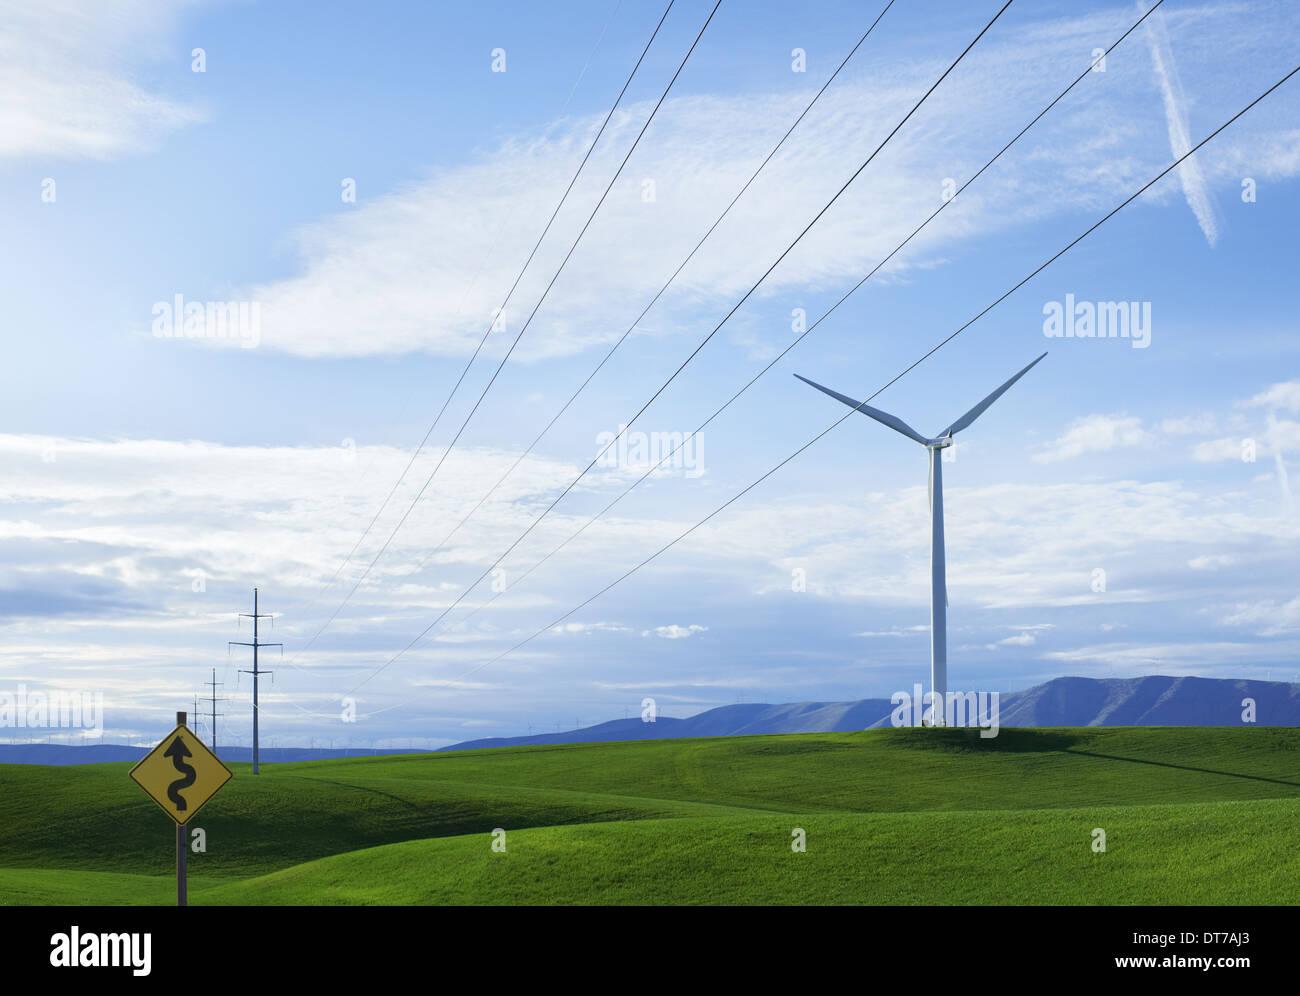 Éoliennes sur une colline herbeuse road sign warning winding road Green la production d'énergie durable Washington USA USA Photo Stock